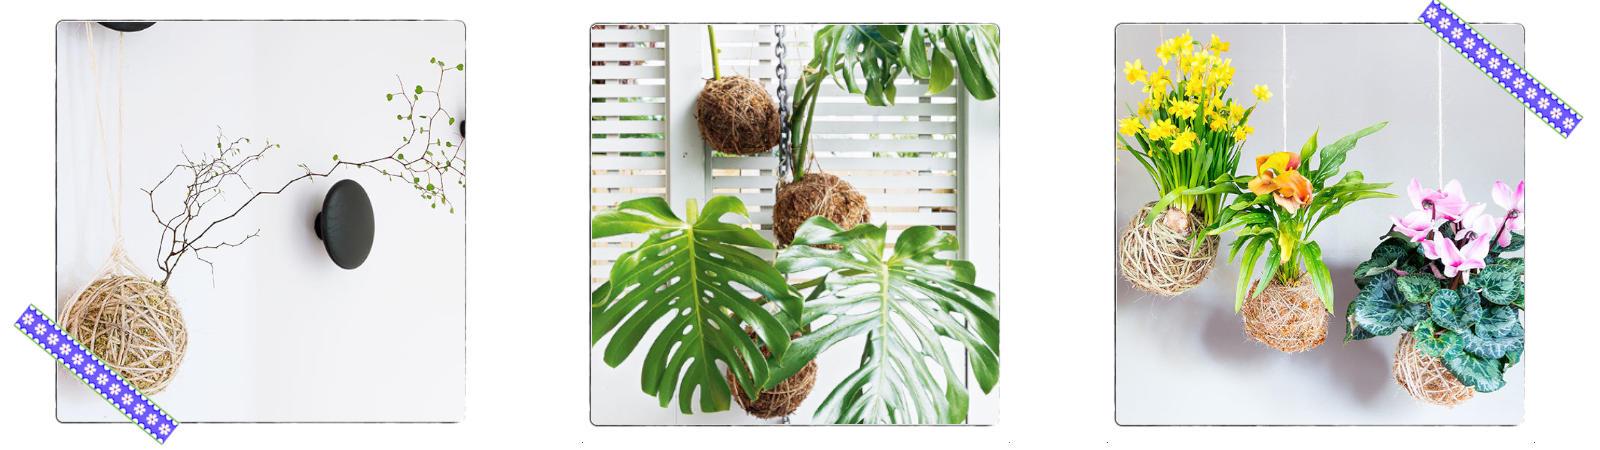 Nachhaltigkeit-im-Alltag-Kokemda-Pflanzen-1600x450